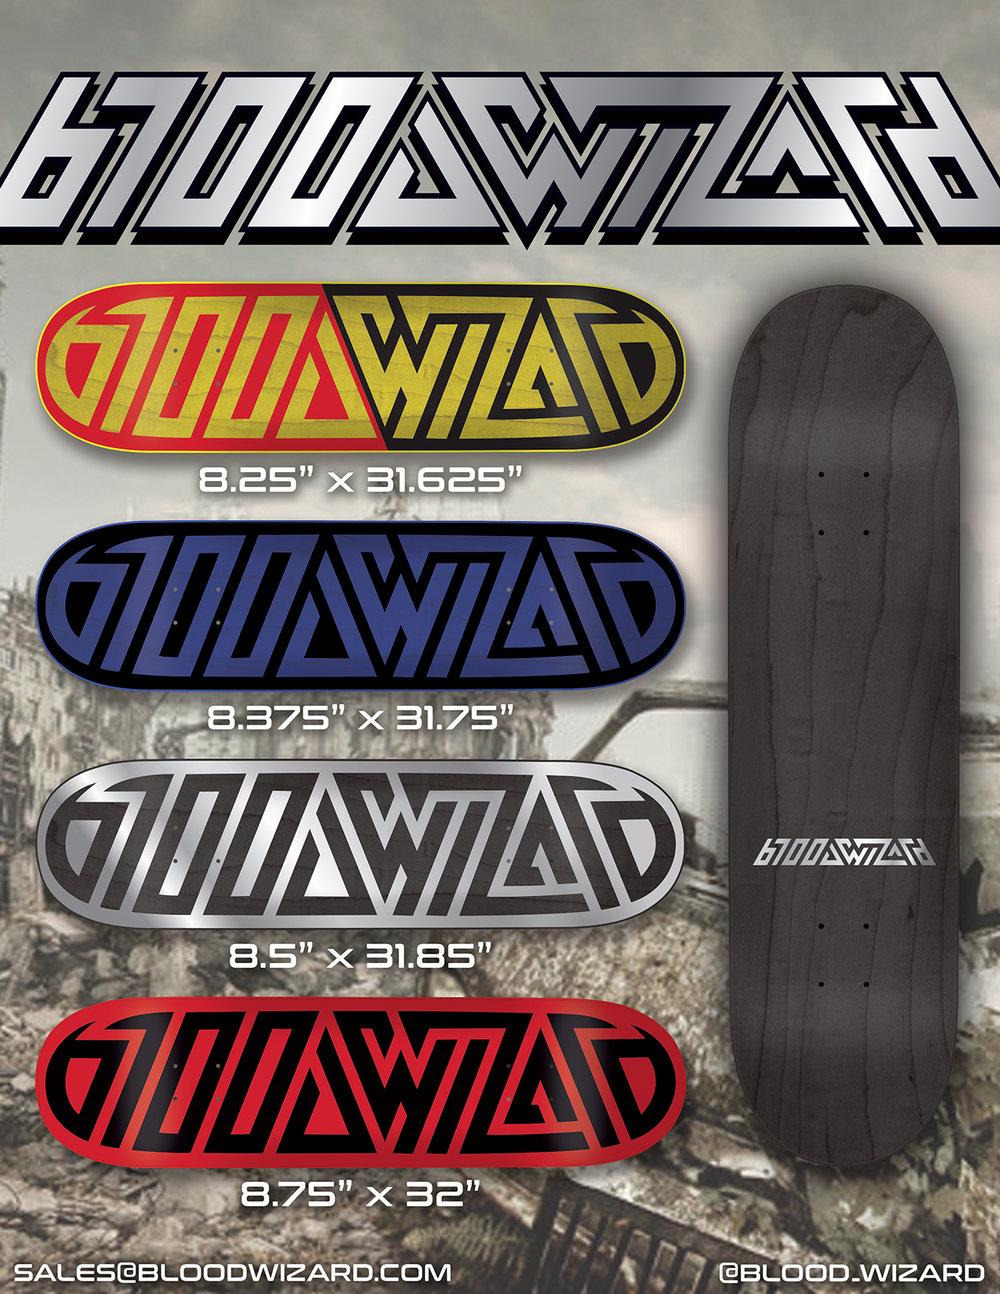 FUTURE_WASTELAND_logo_boards_web.jpg